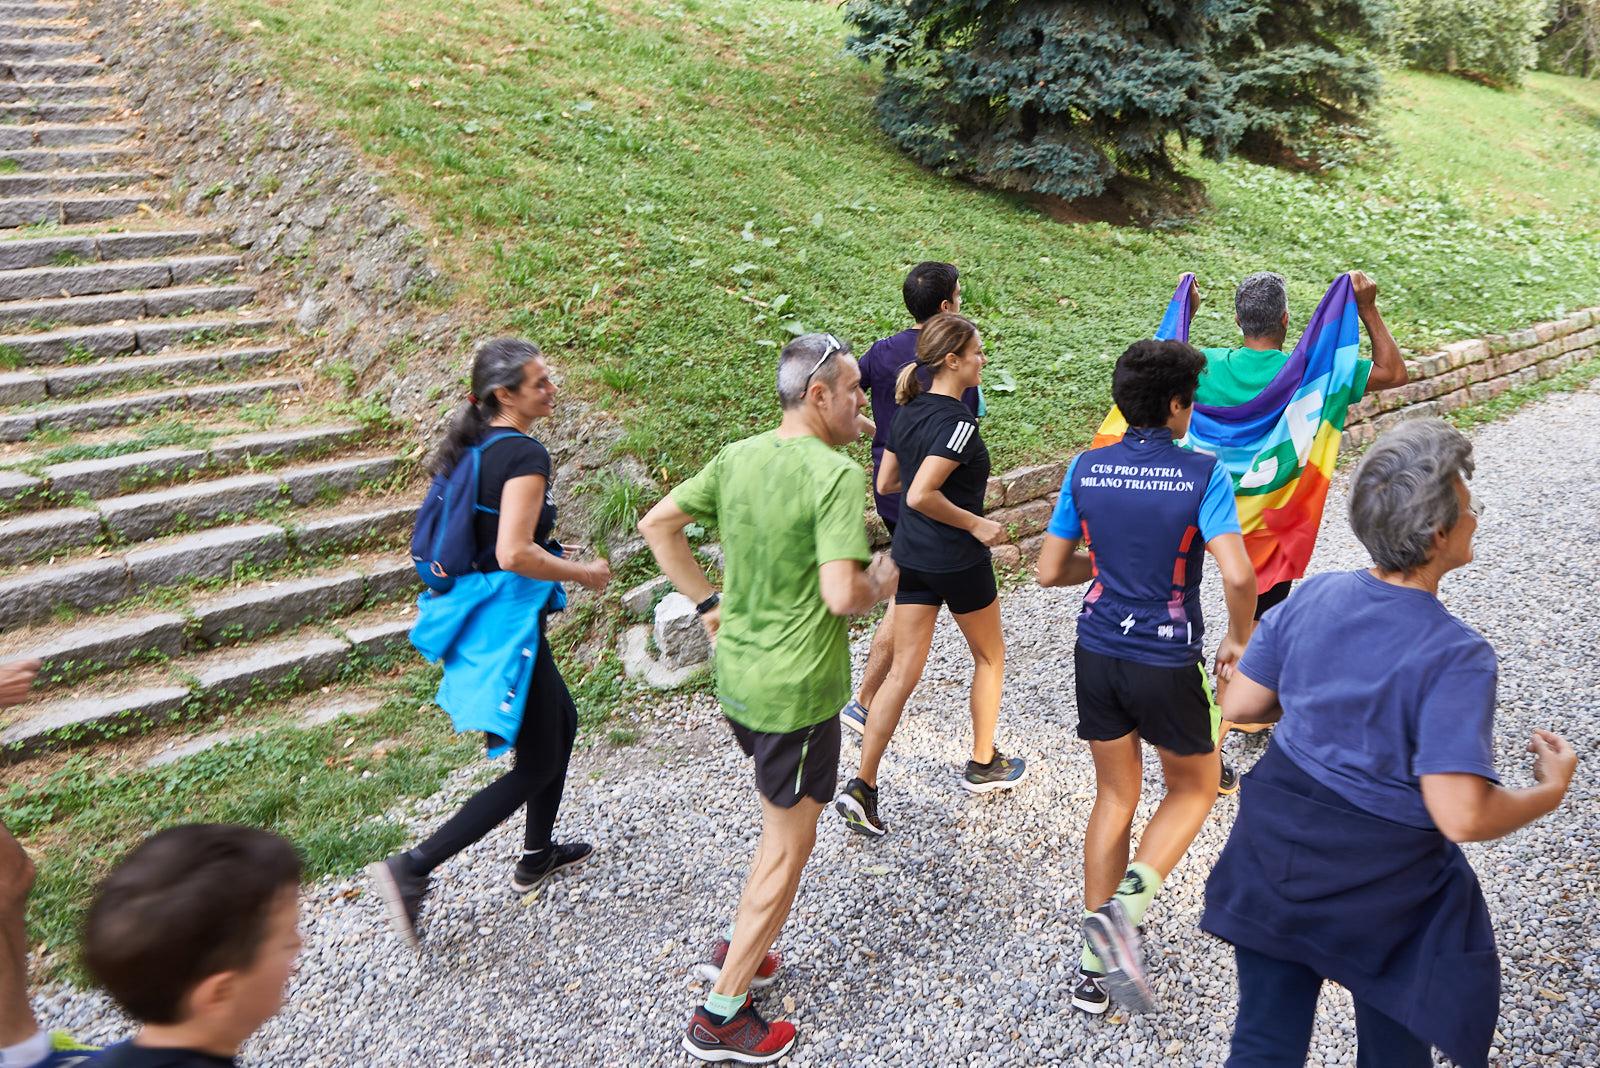 L'allenamento per la pace con Ara Khatchadourian